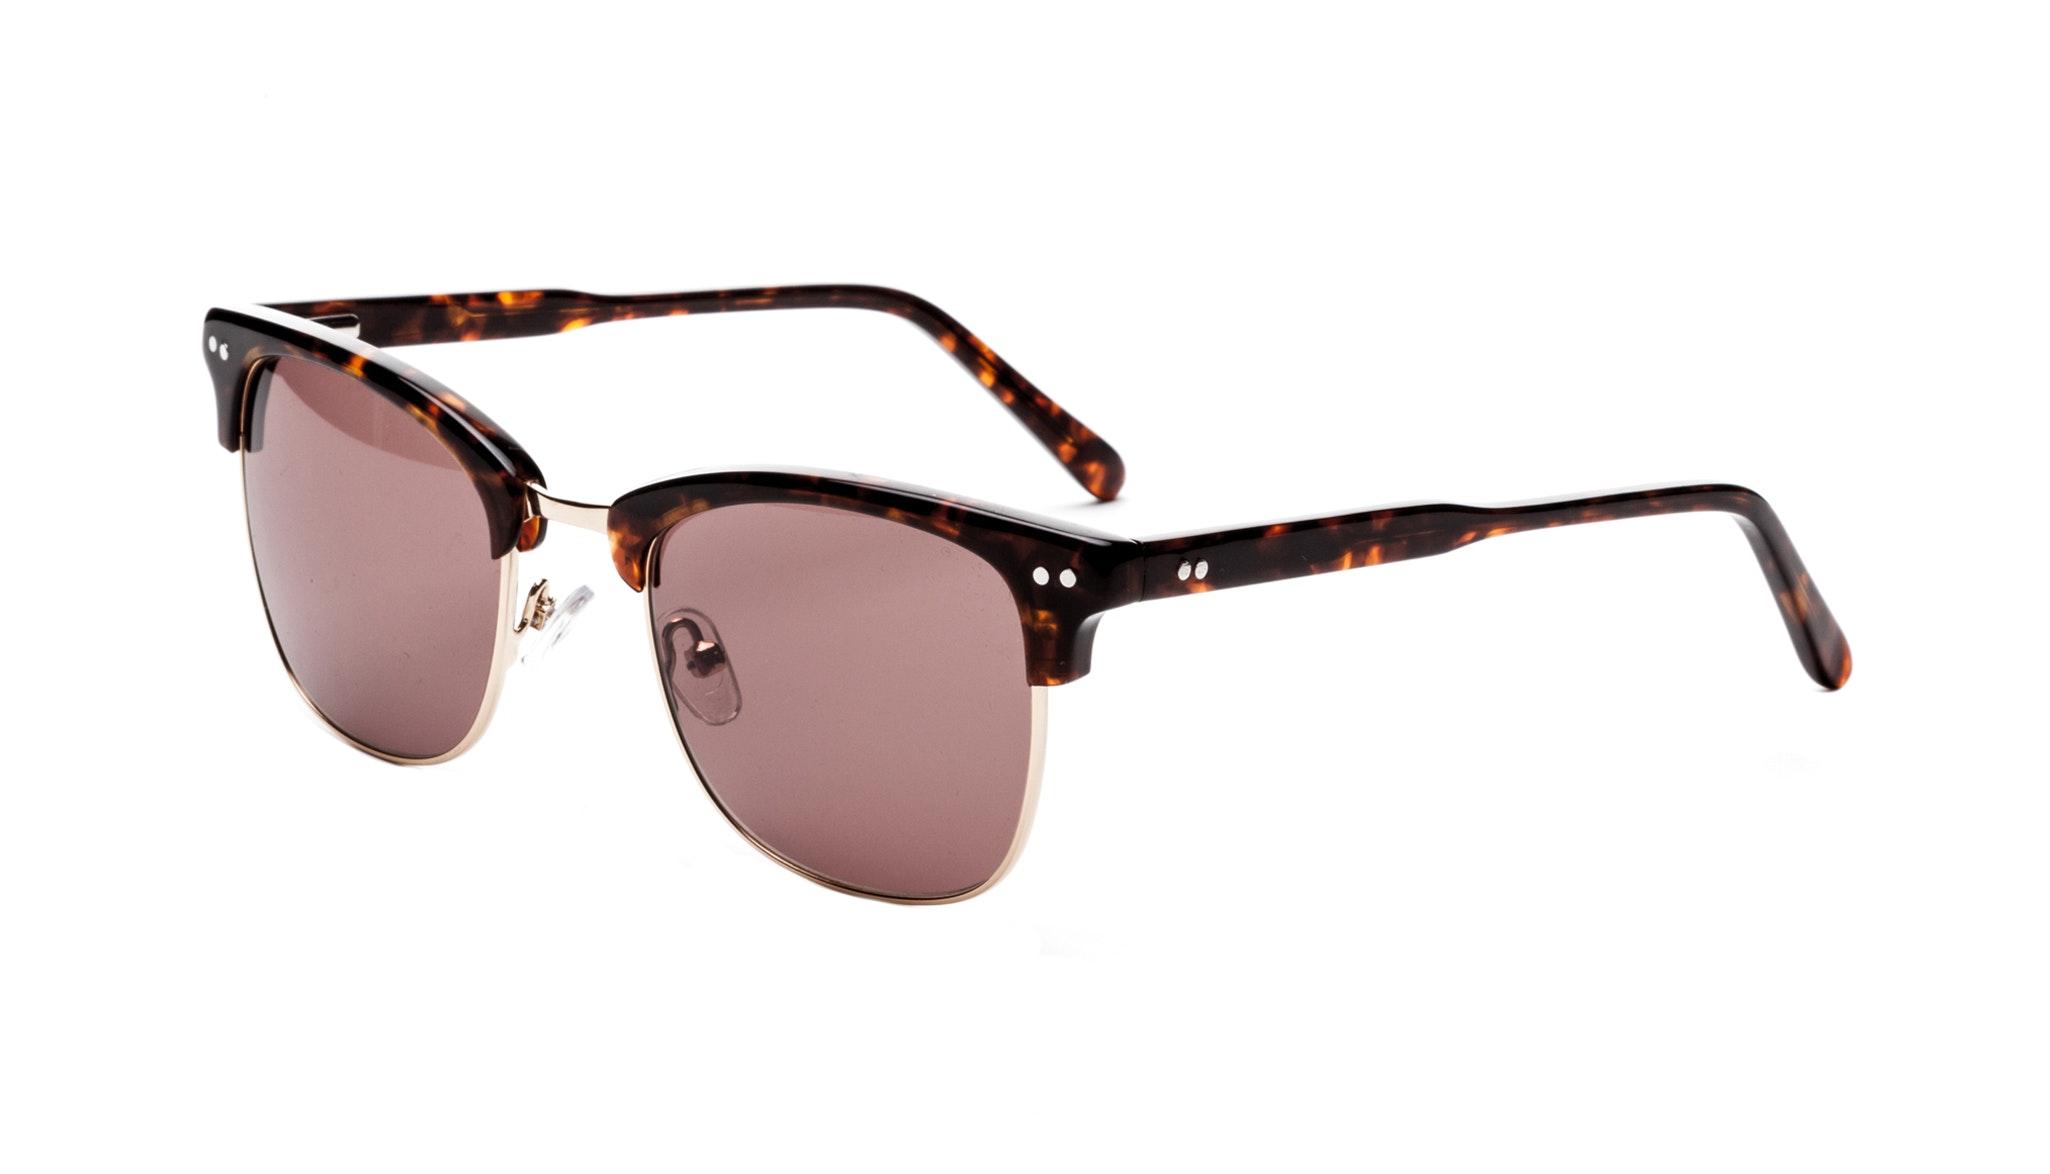 Affordable Fashion Glasses Square Sunglasses Men Lift Gold Sepia Tilt